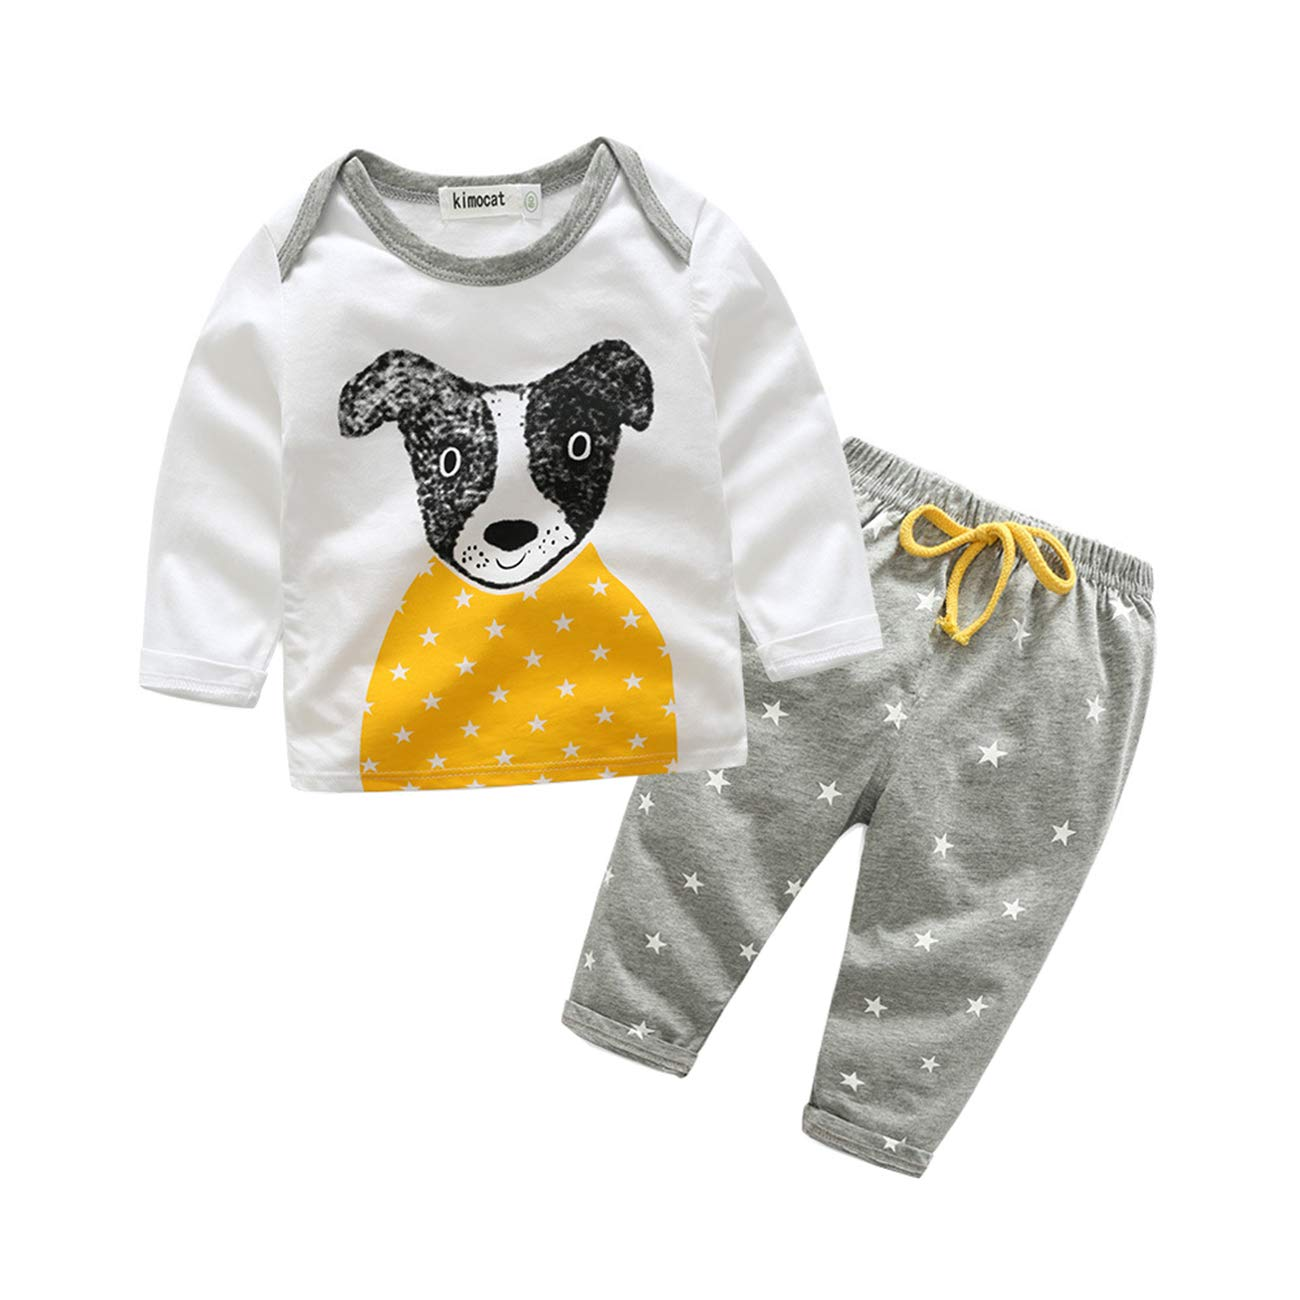 FCQNY Kids Boys Long Sleeve Casual Cotton Cartoon Tops T-Shirt+Pants Set 2pcs